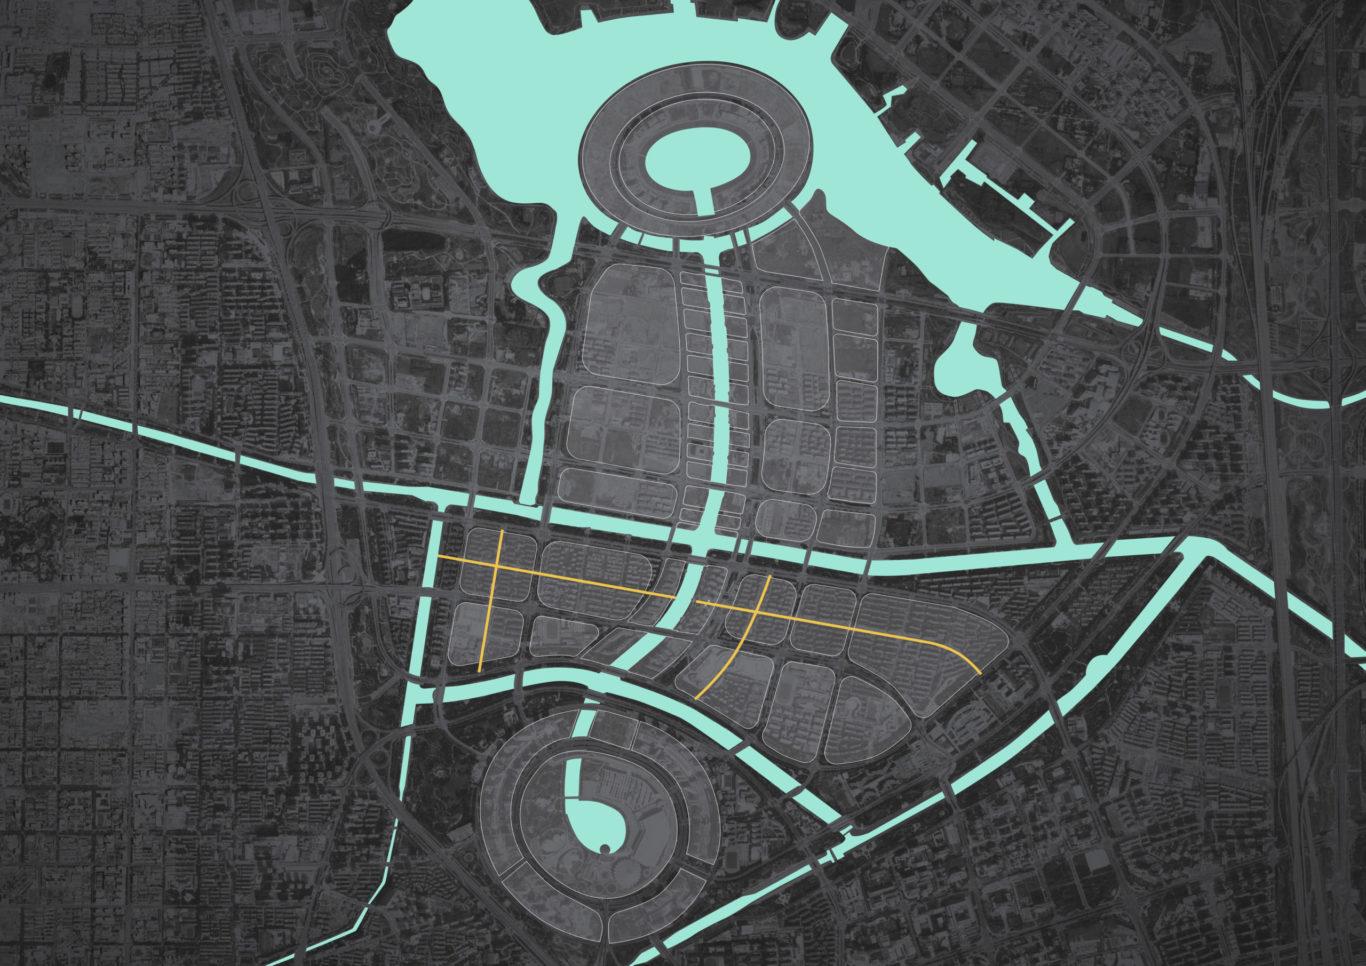 Slide 5 of 9, Zhengzhou Public Realm Improvement Plan